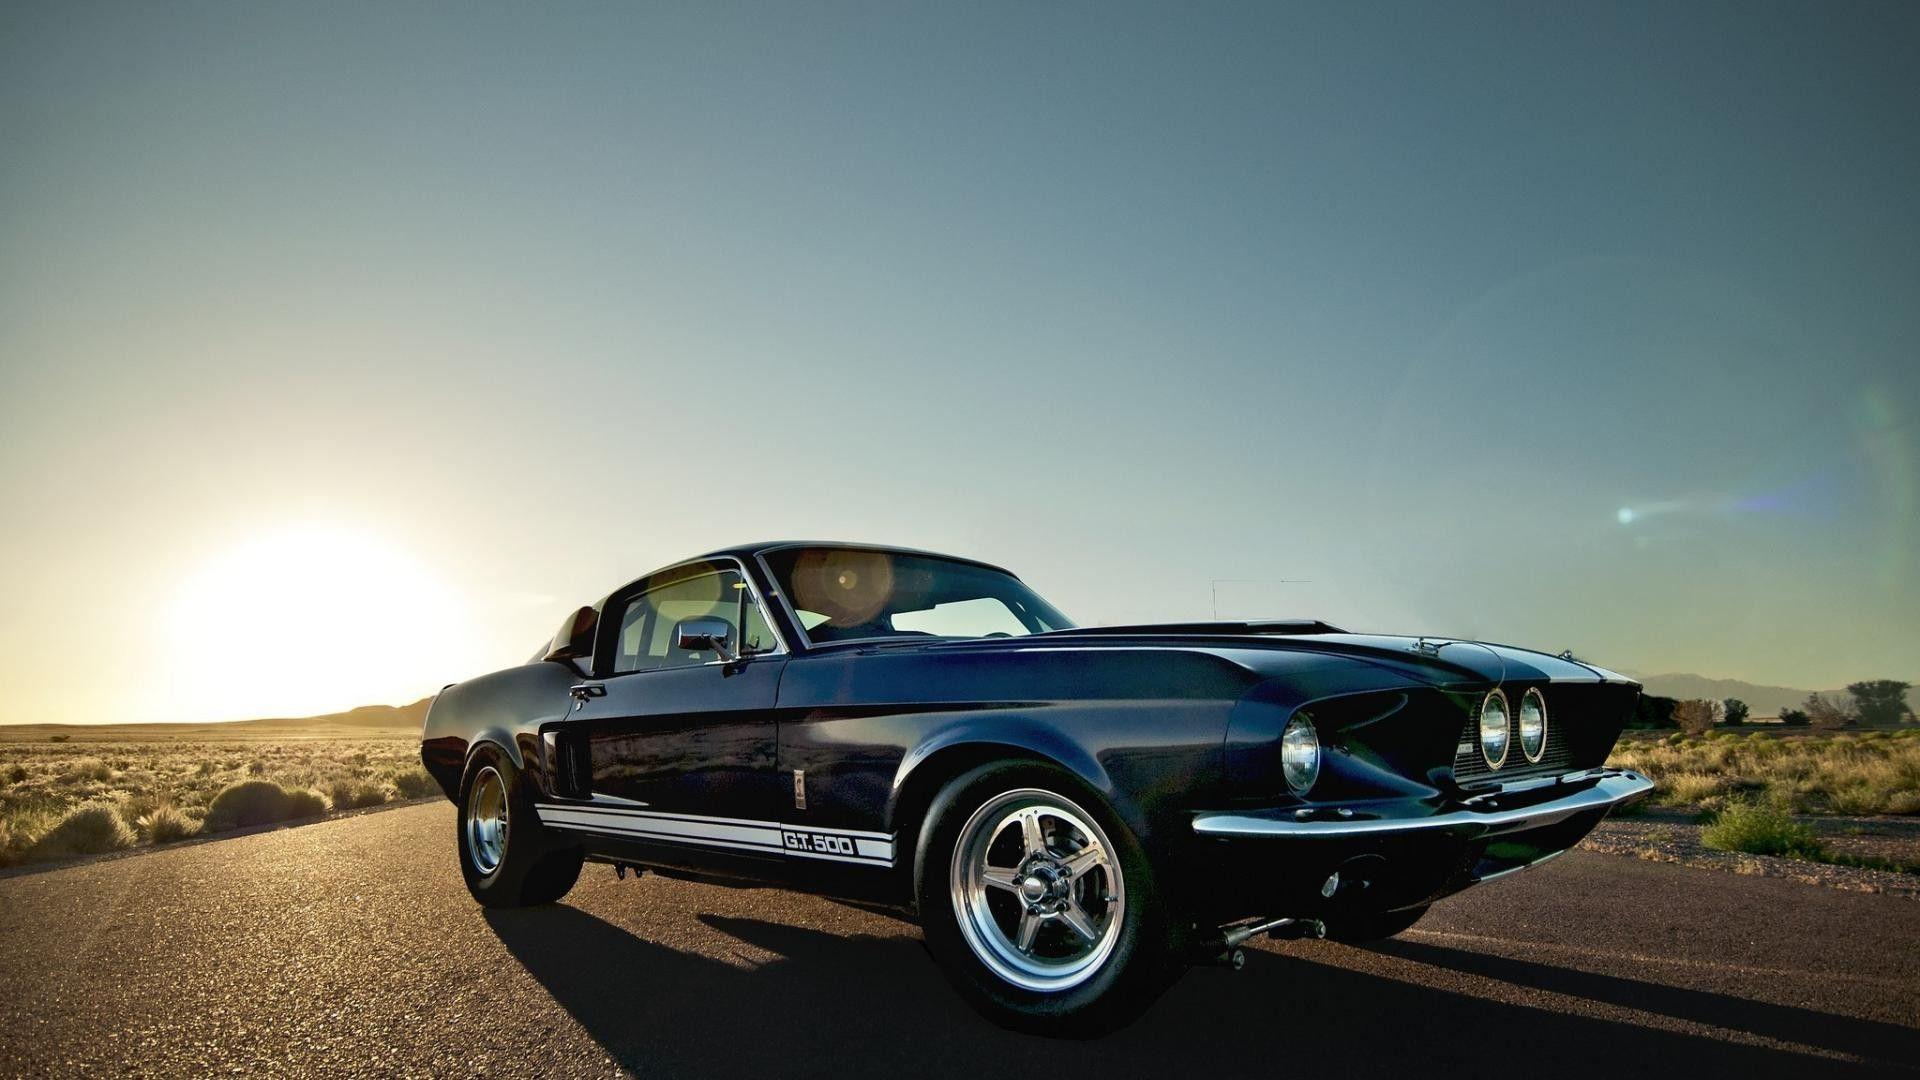 Top Wallpaper High Quality Car - Mustang-HD-Wallpaper-High-Quality-for-laptop-03  Collection_811529.jpg